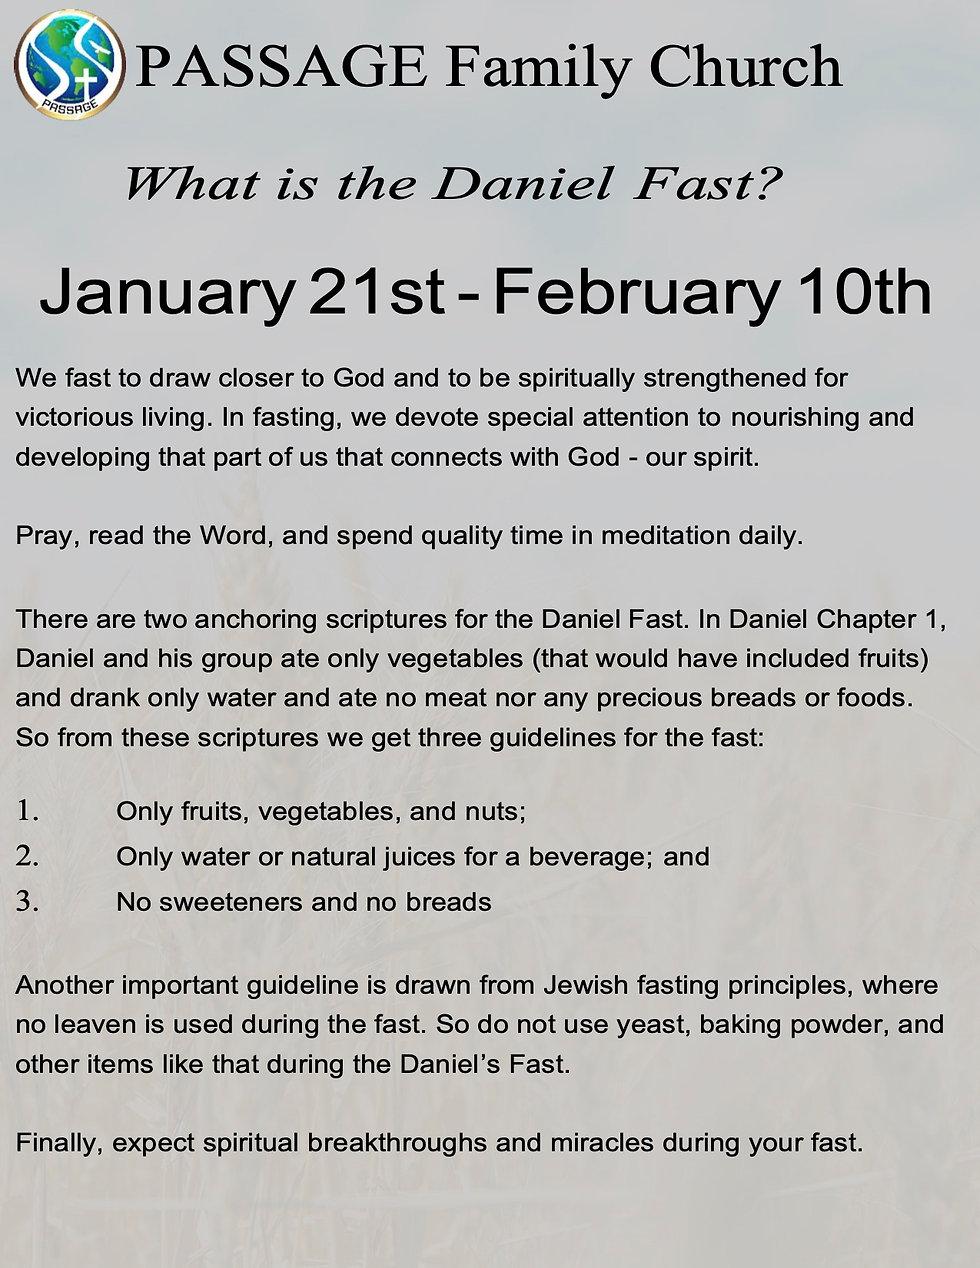 Daniel Fast Flyer (PDFf).jpg